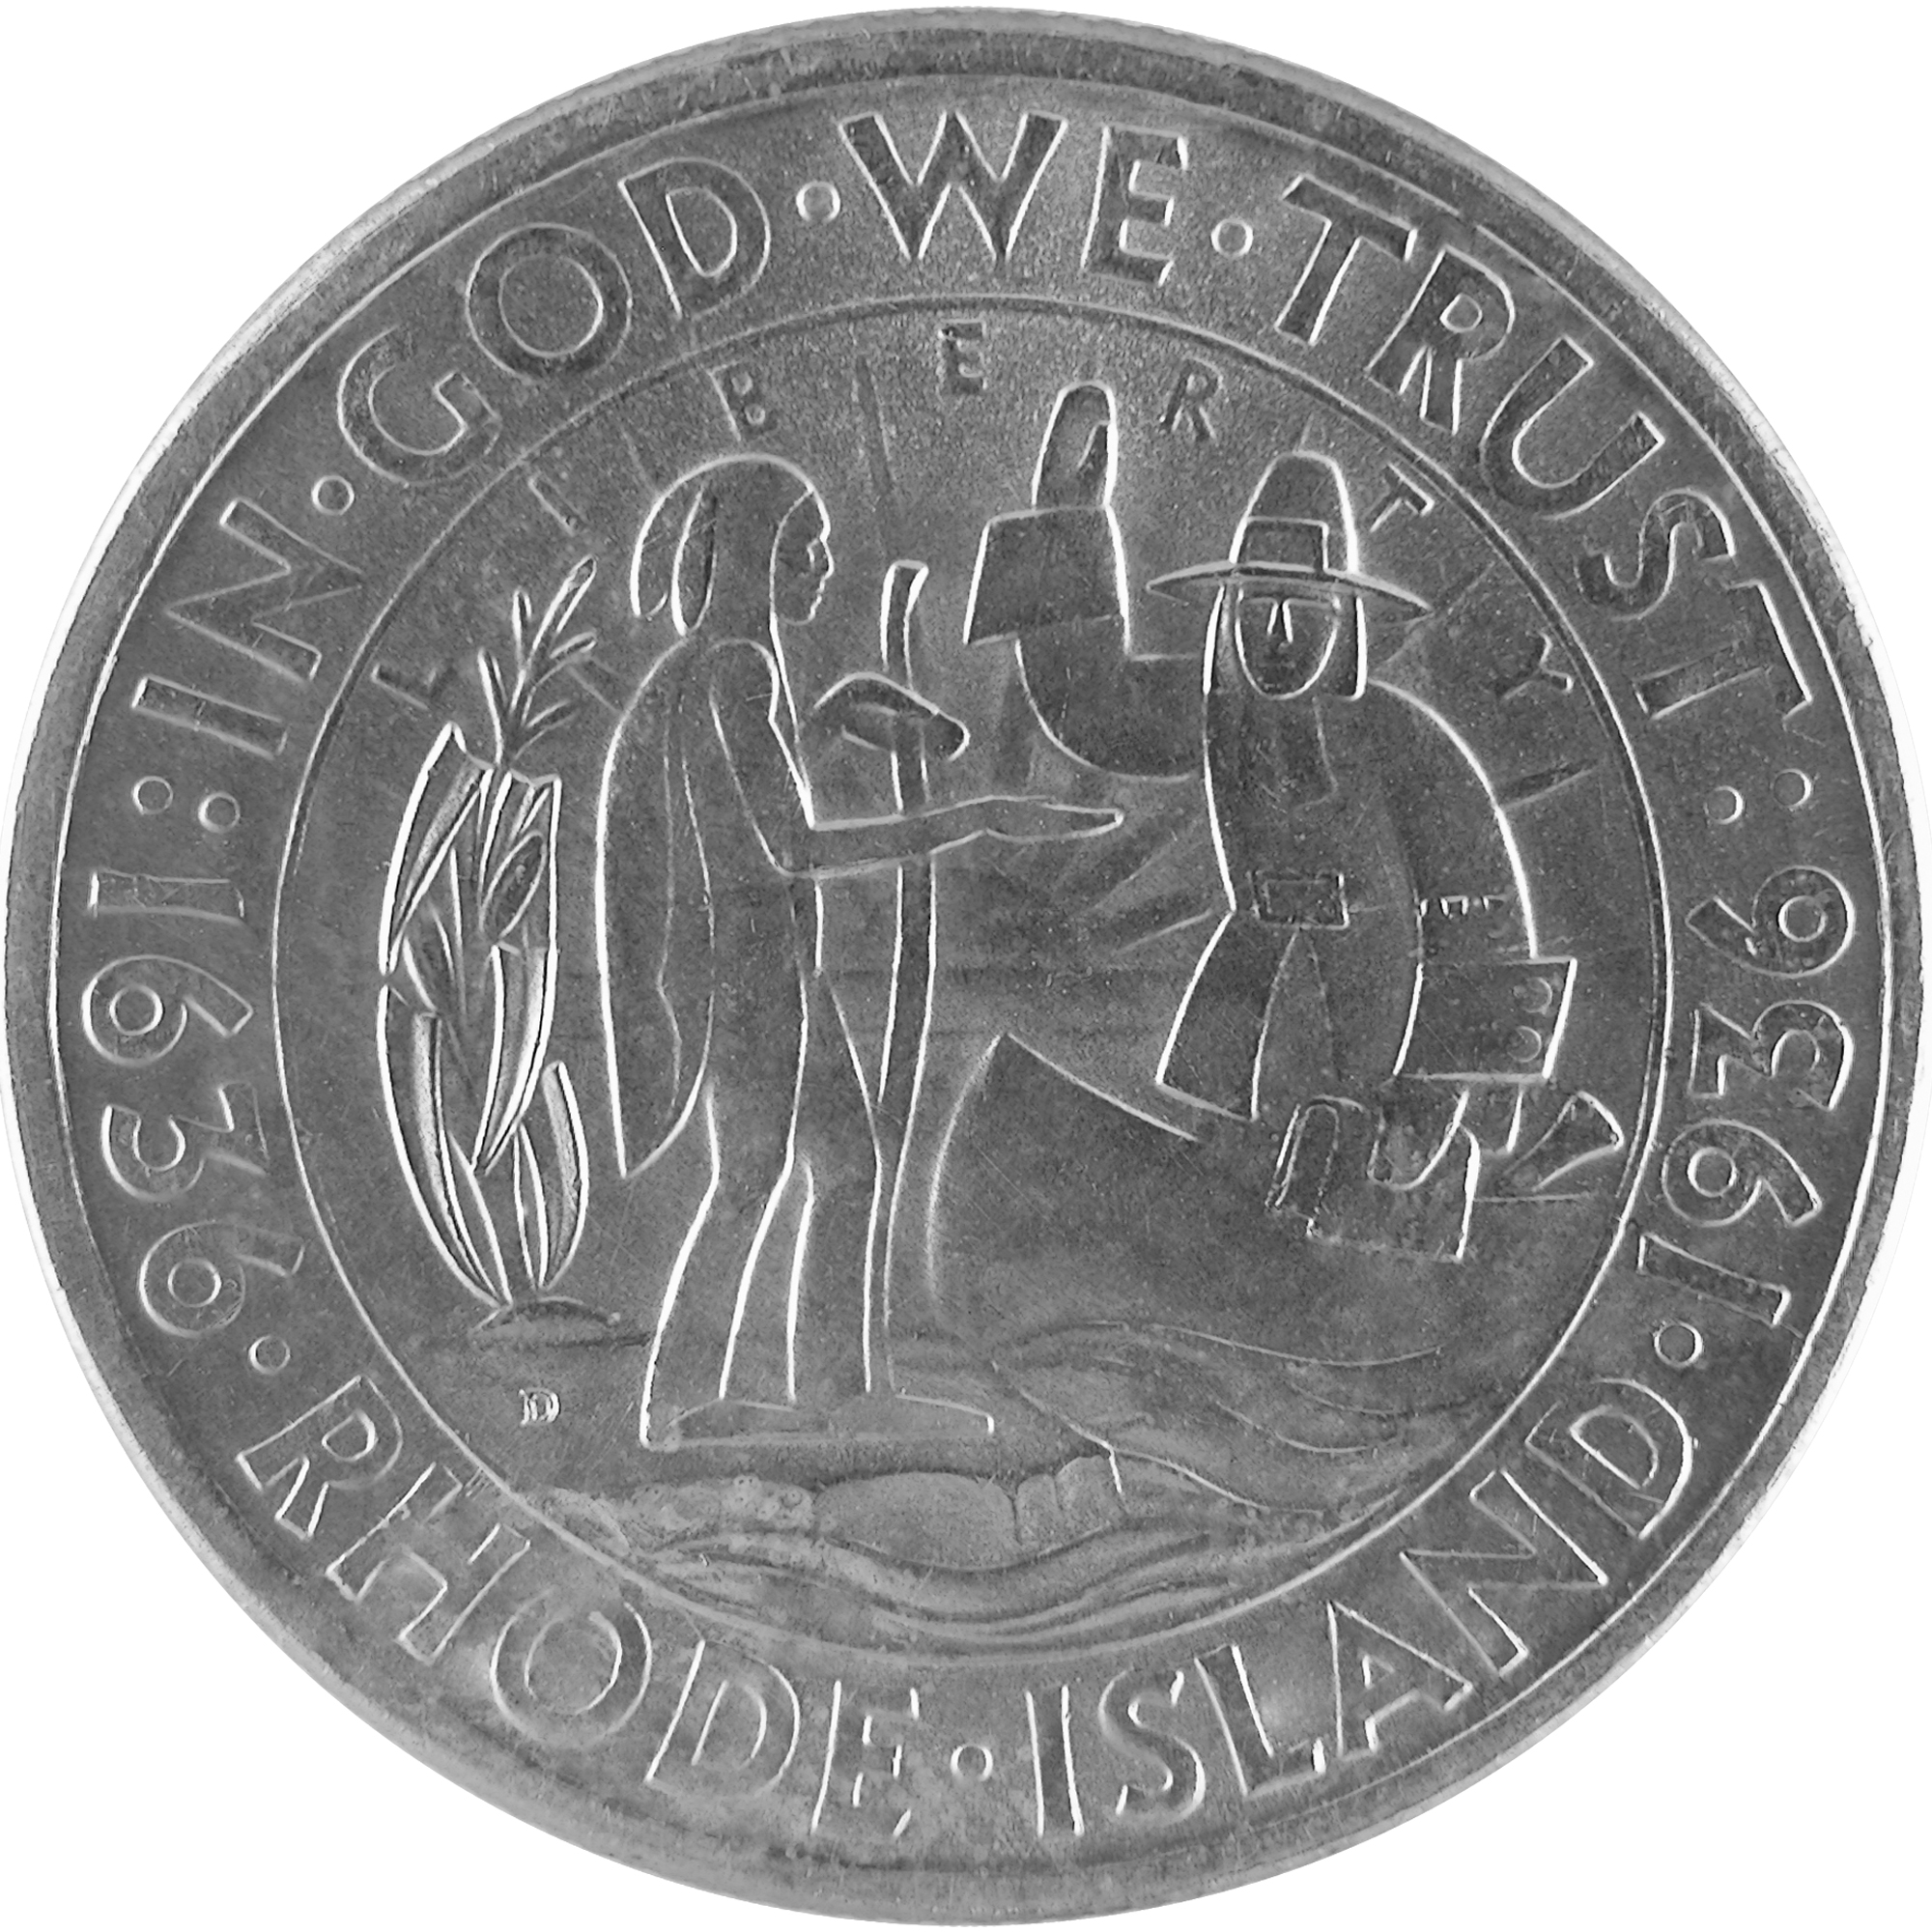 1936 Rhode Island Tercentenary Commemorative Silver Half Dollar Coin Obverse